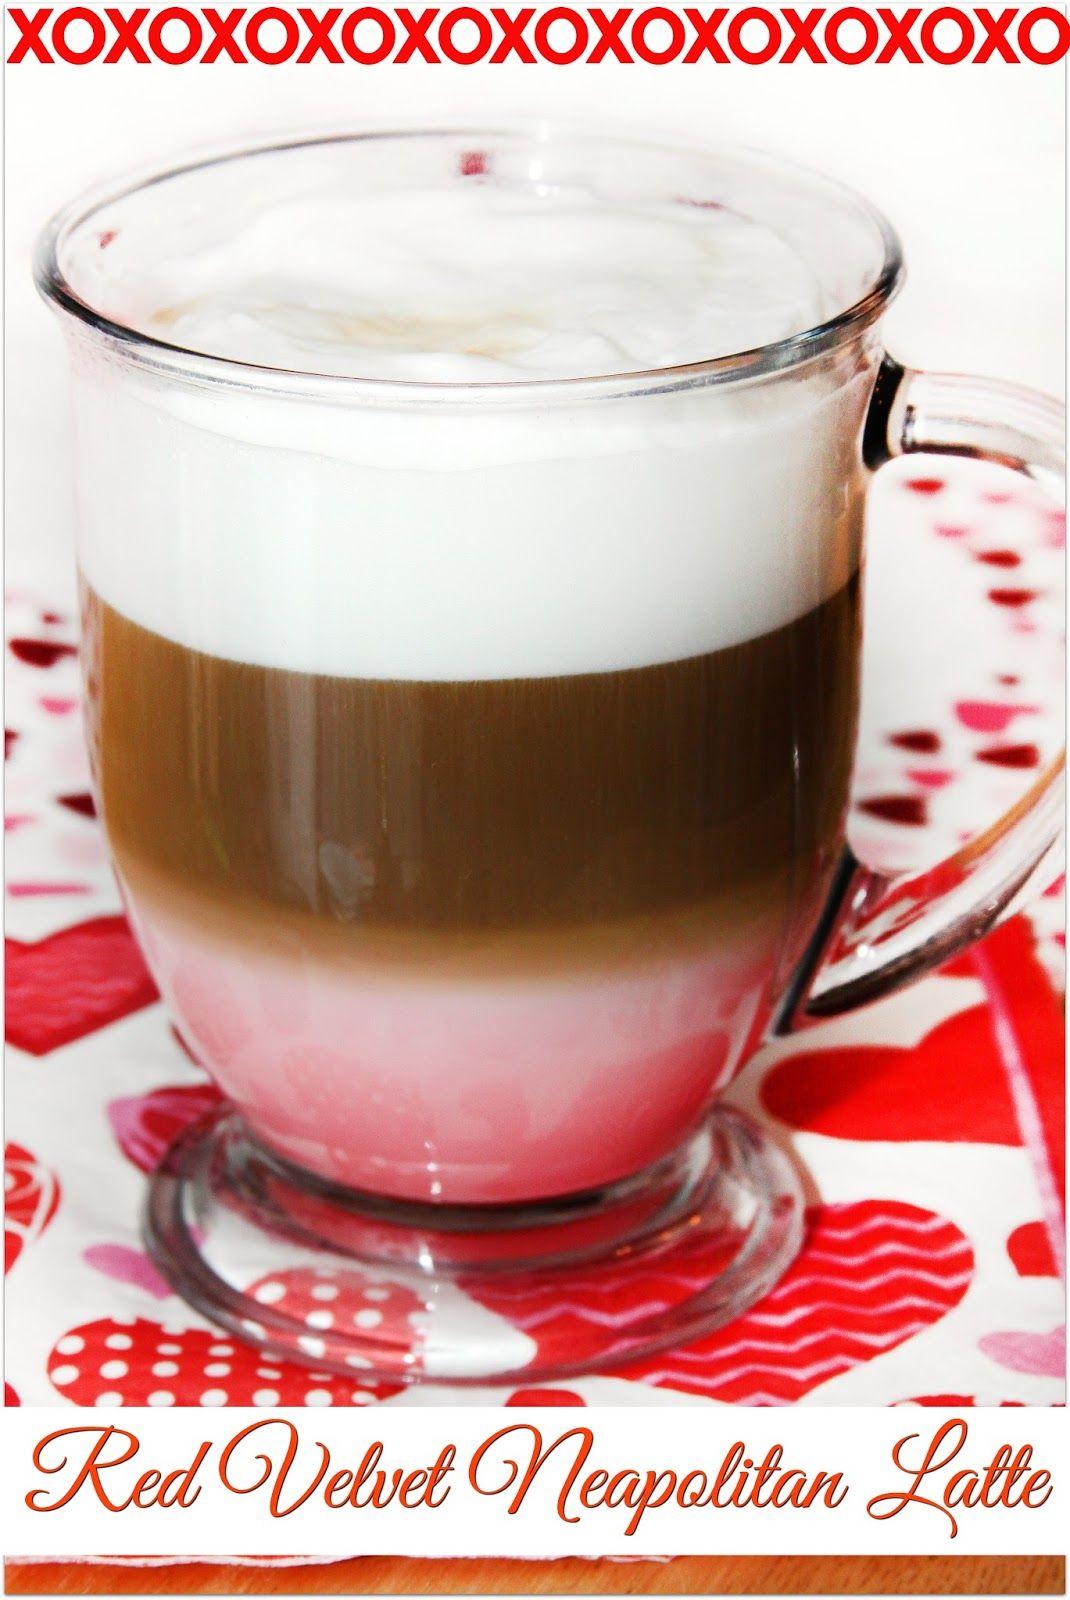 Red Velvet Neapolitan Latte Recipe Latte Coffee Recipes Neapolitan